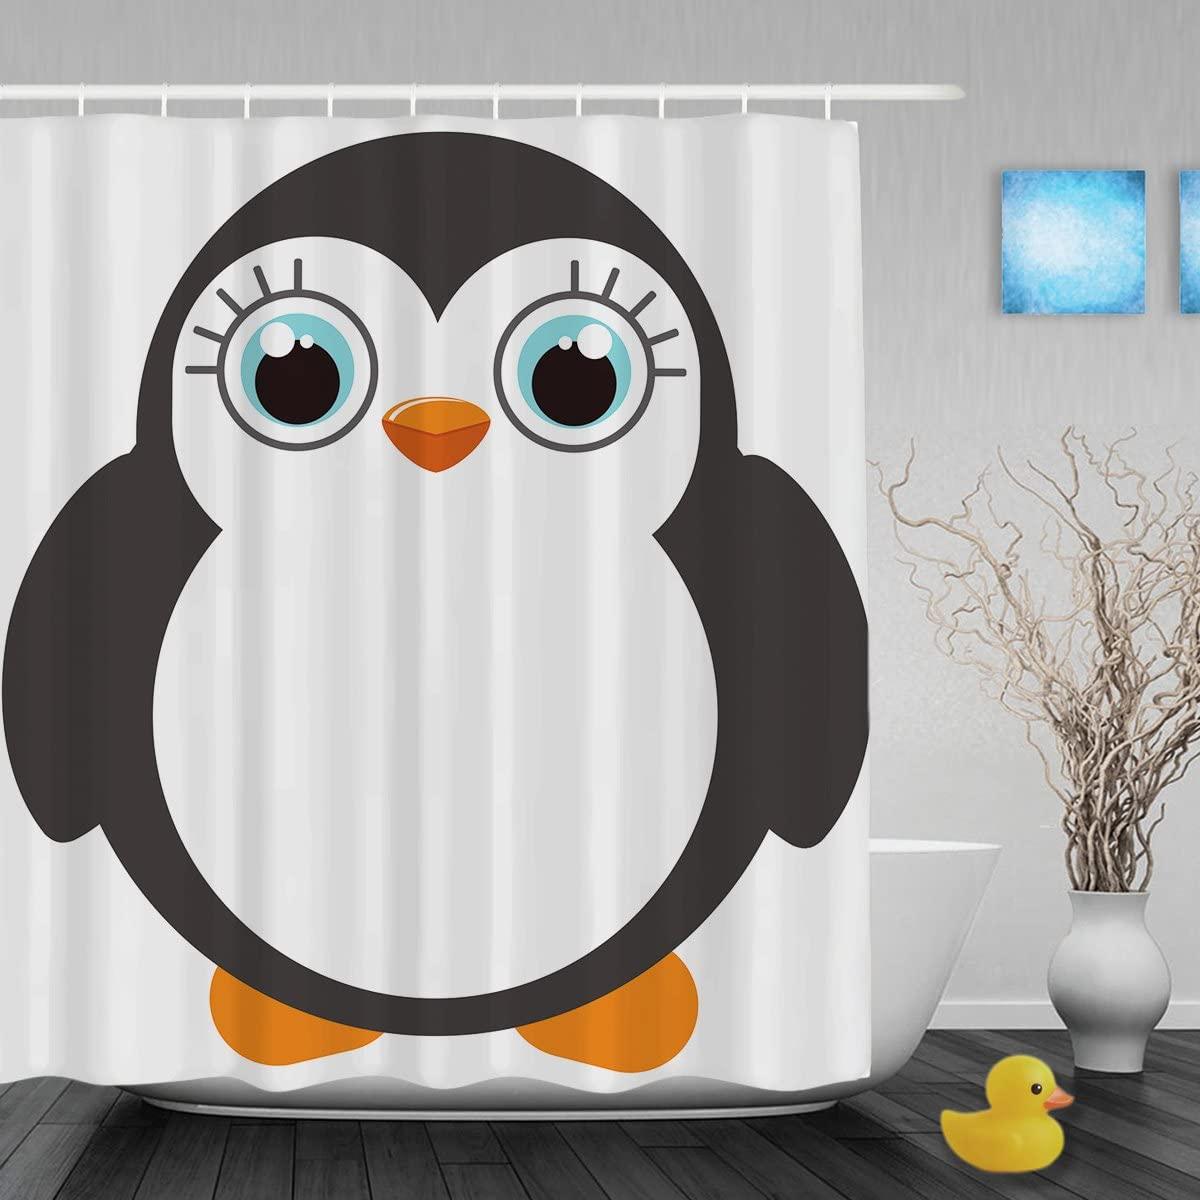 Cute Fat Penguin Decor Bathroom Shower Curtain Cartoon Animals Designed Shower Curtains Waterproof Mildewproof Polyester Fabric 36